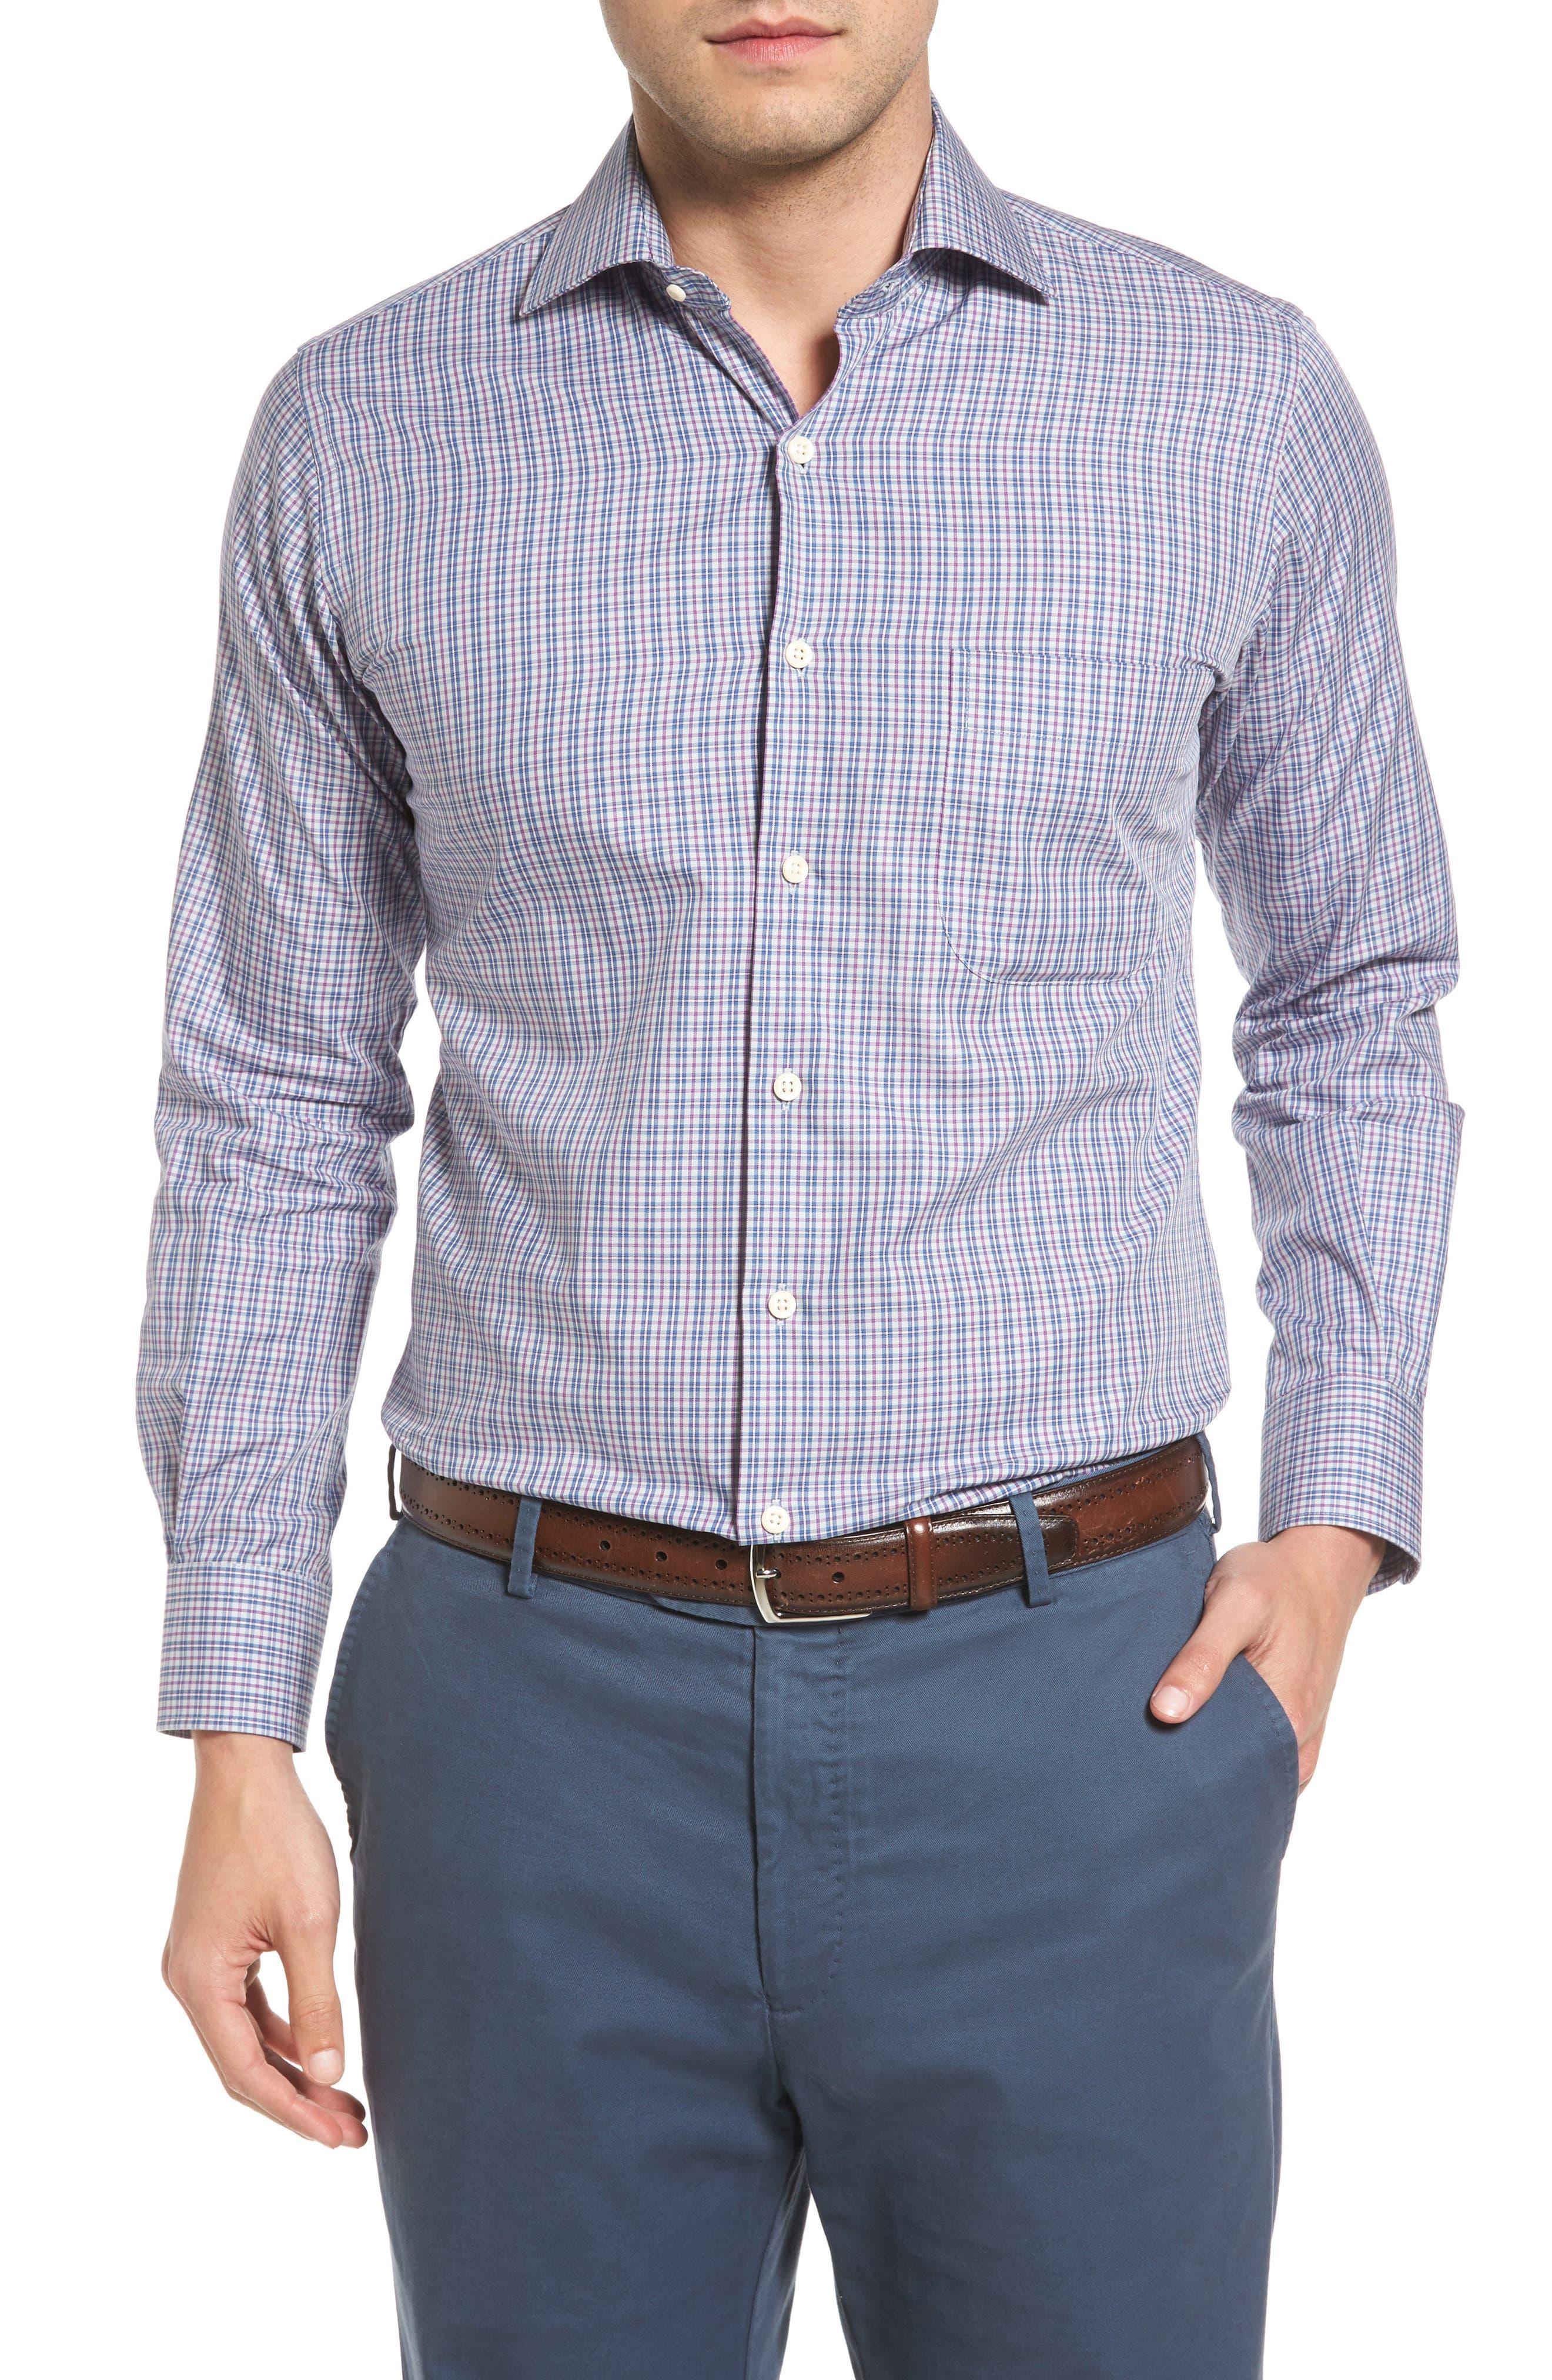 Hillock Plaid Regular Fit Sport Shirt,                         Main,                         color, Stingray